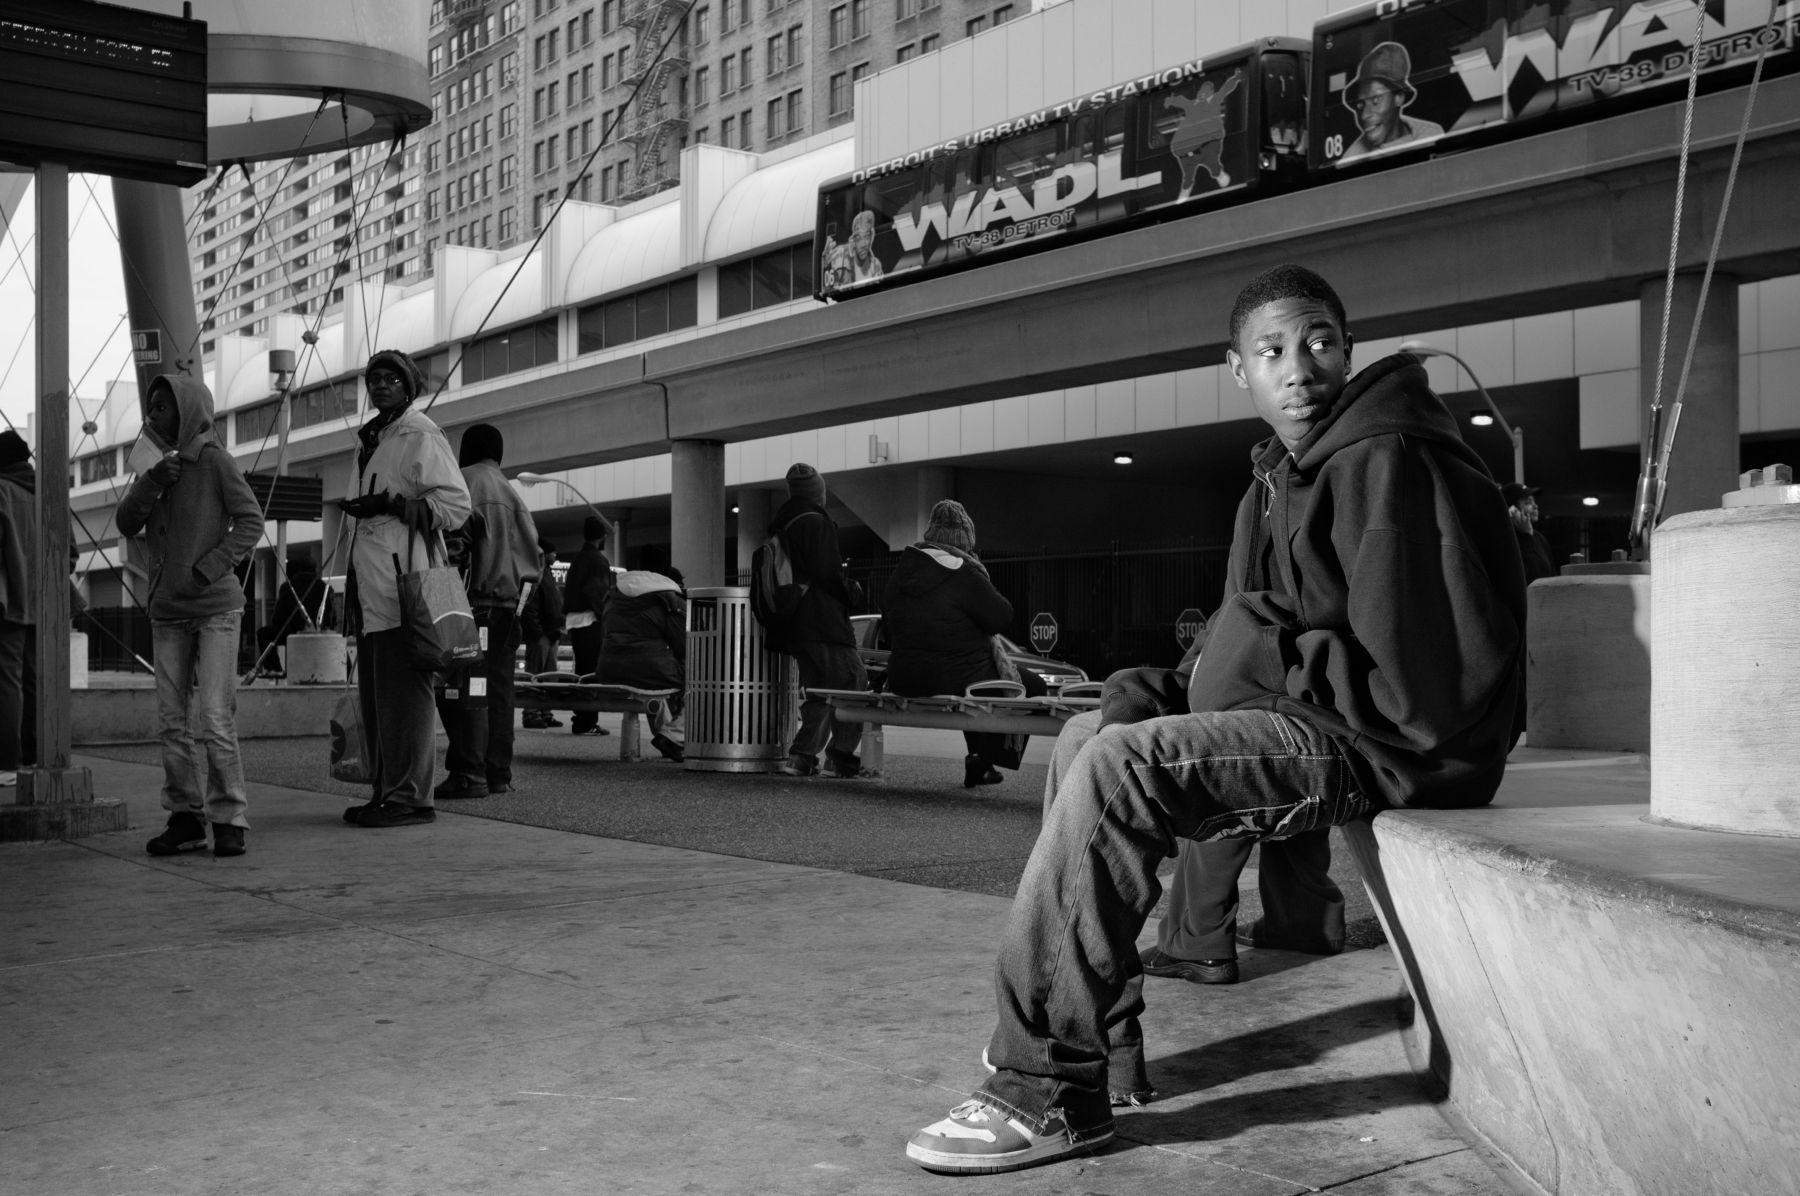 Demetrius, People in Transition Series, Detroit 2012